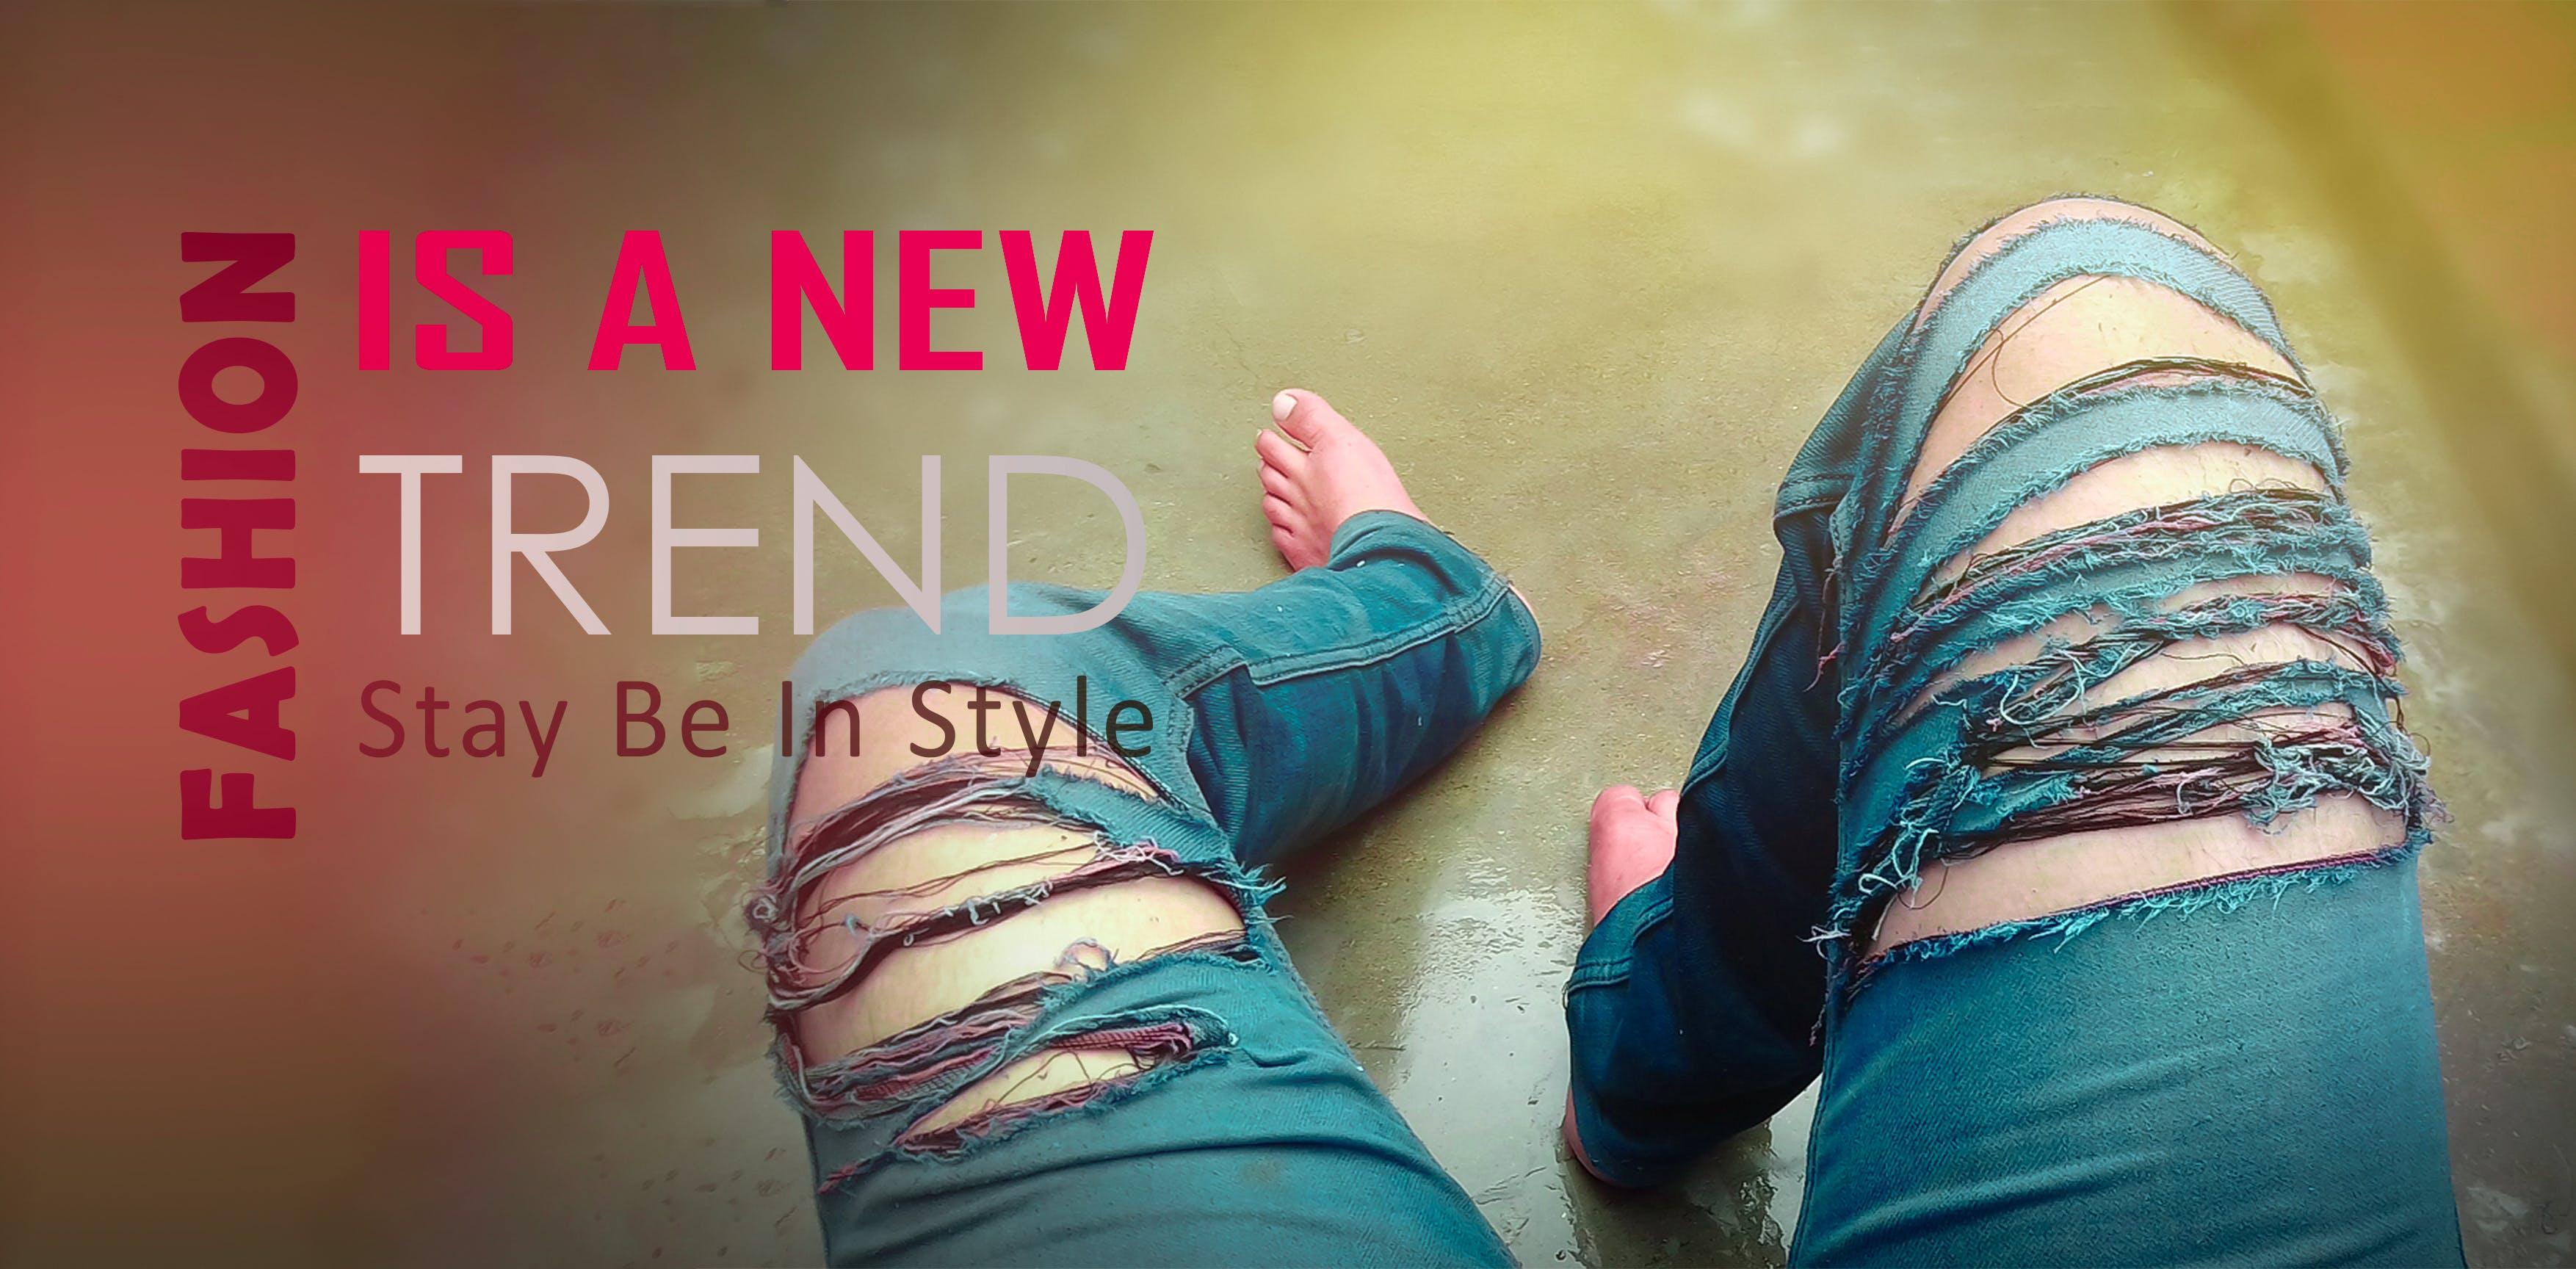 Free stock photo of 4k wallpaper, banner, colorful wallpaper, denim jeans